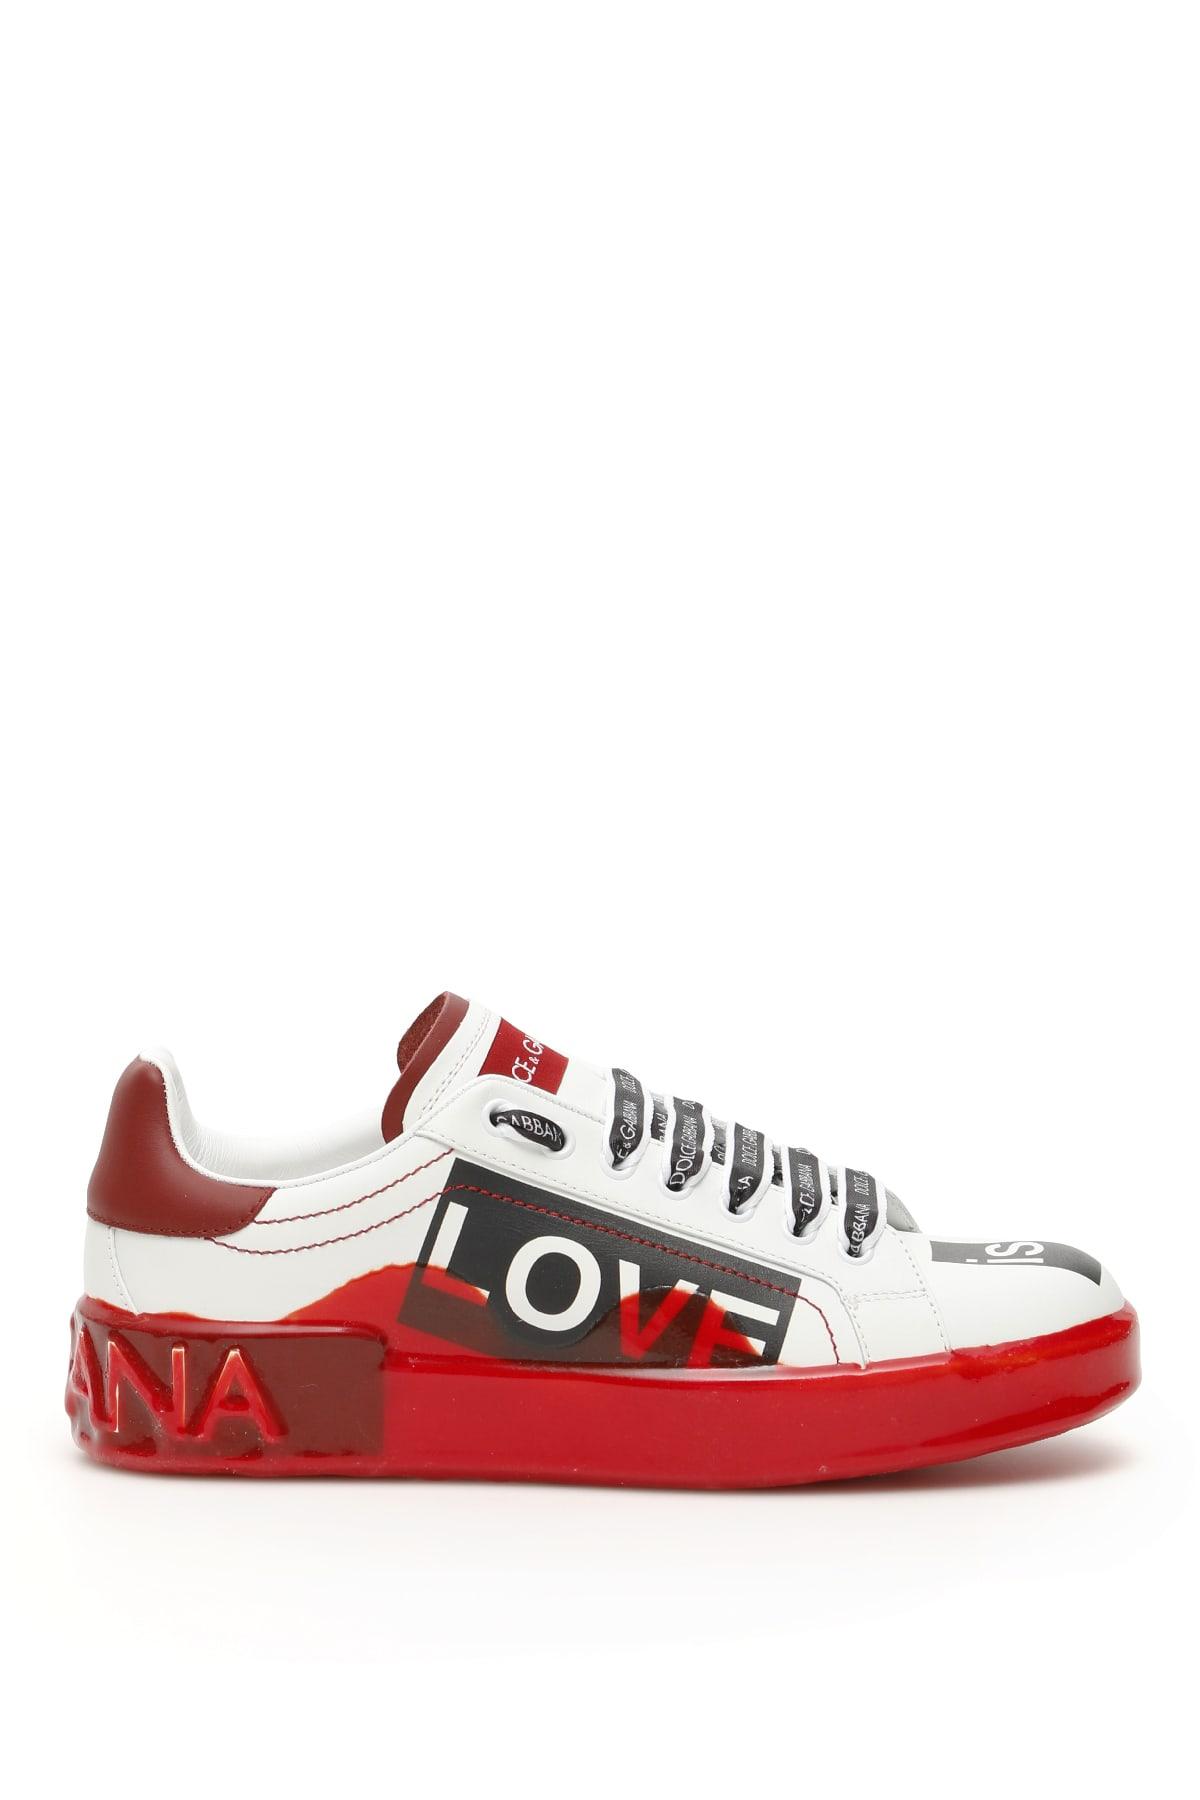 Dolce \u0026 Gabbana Sneakers | italist